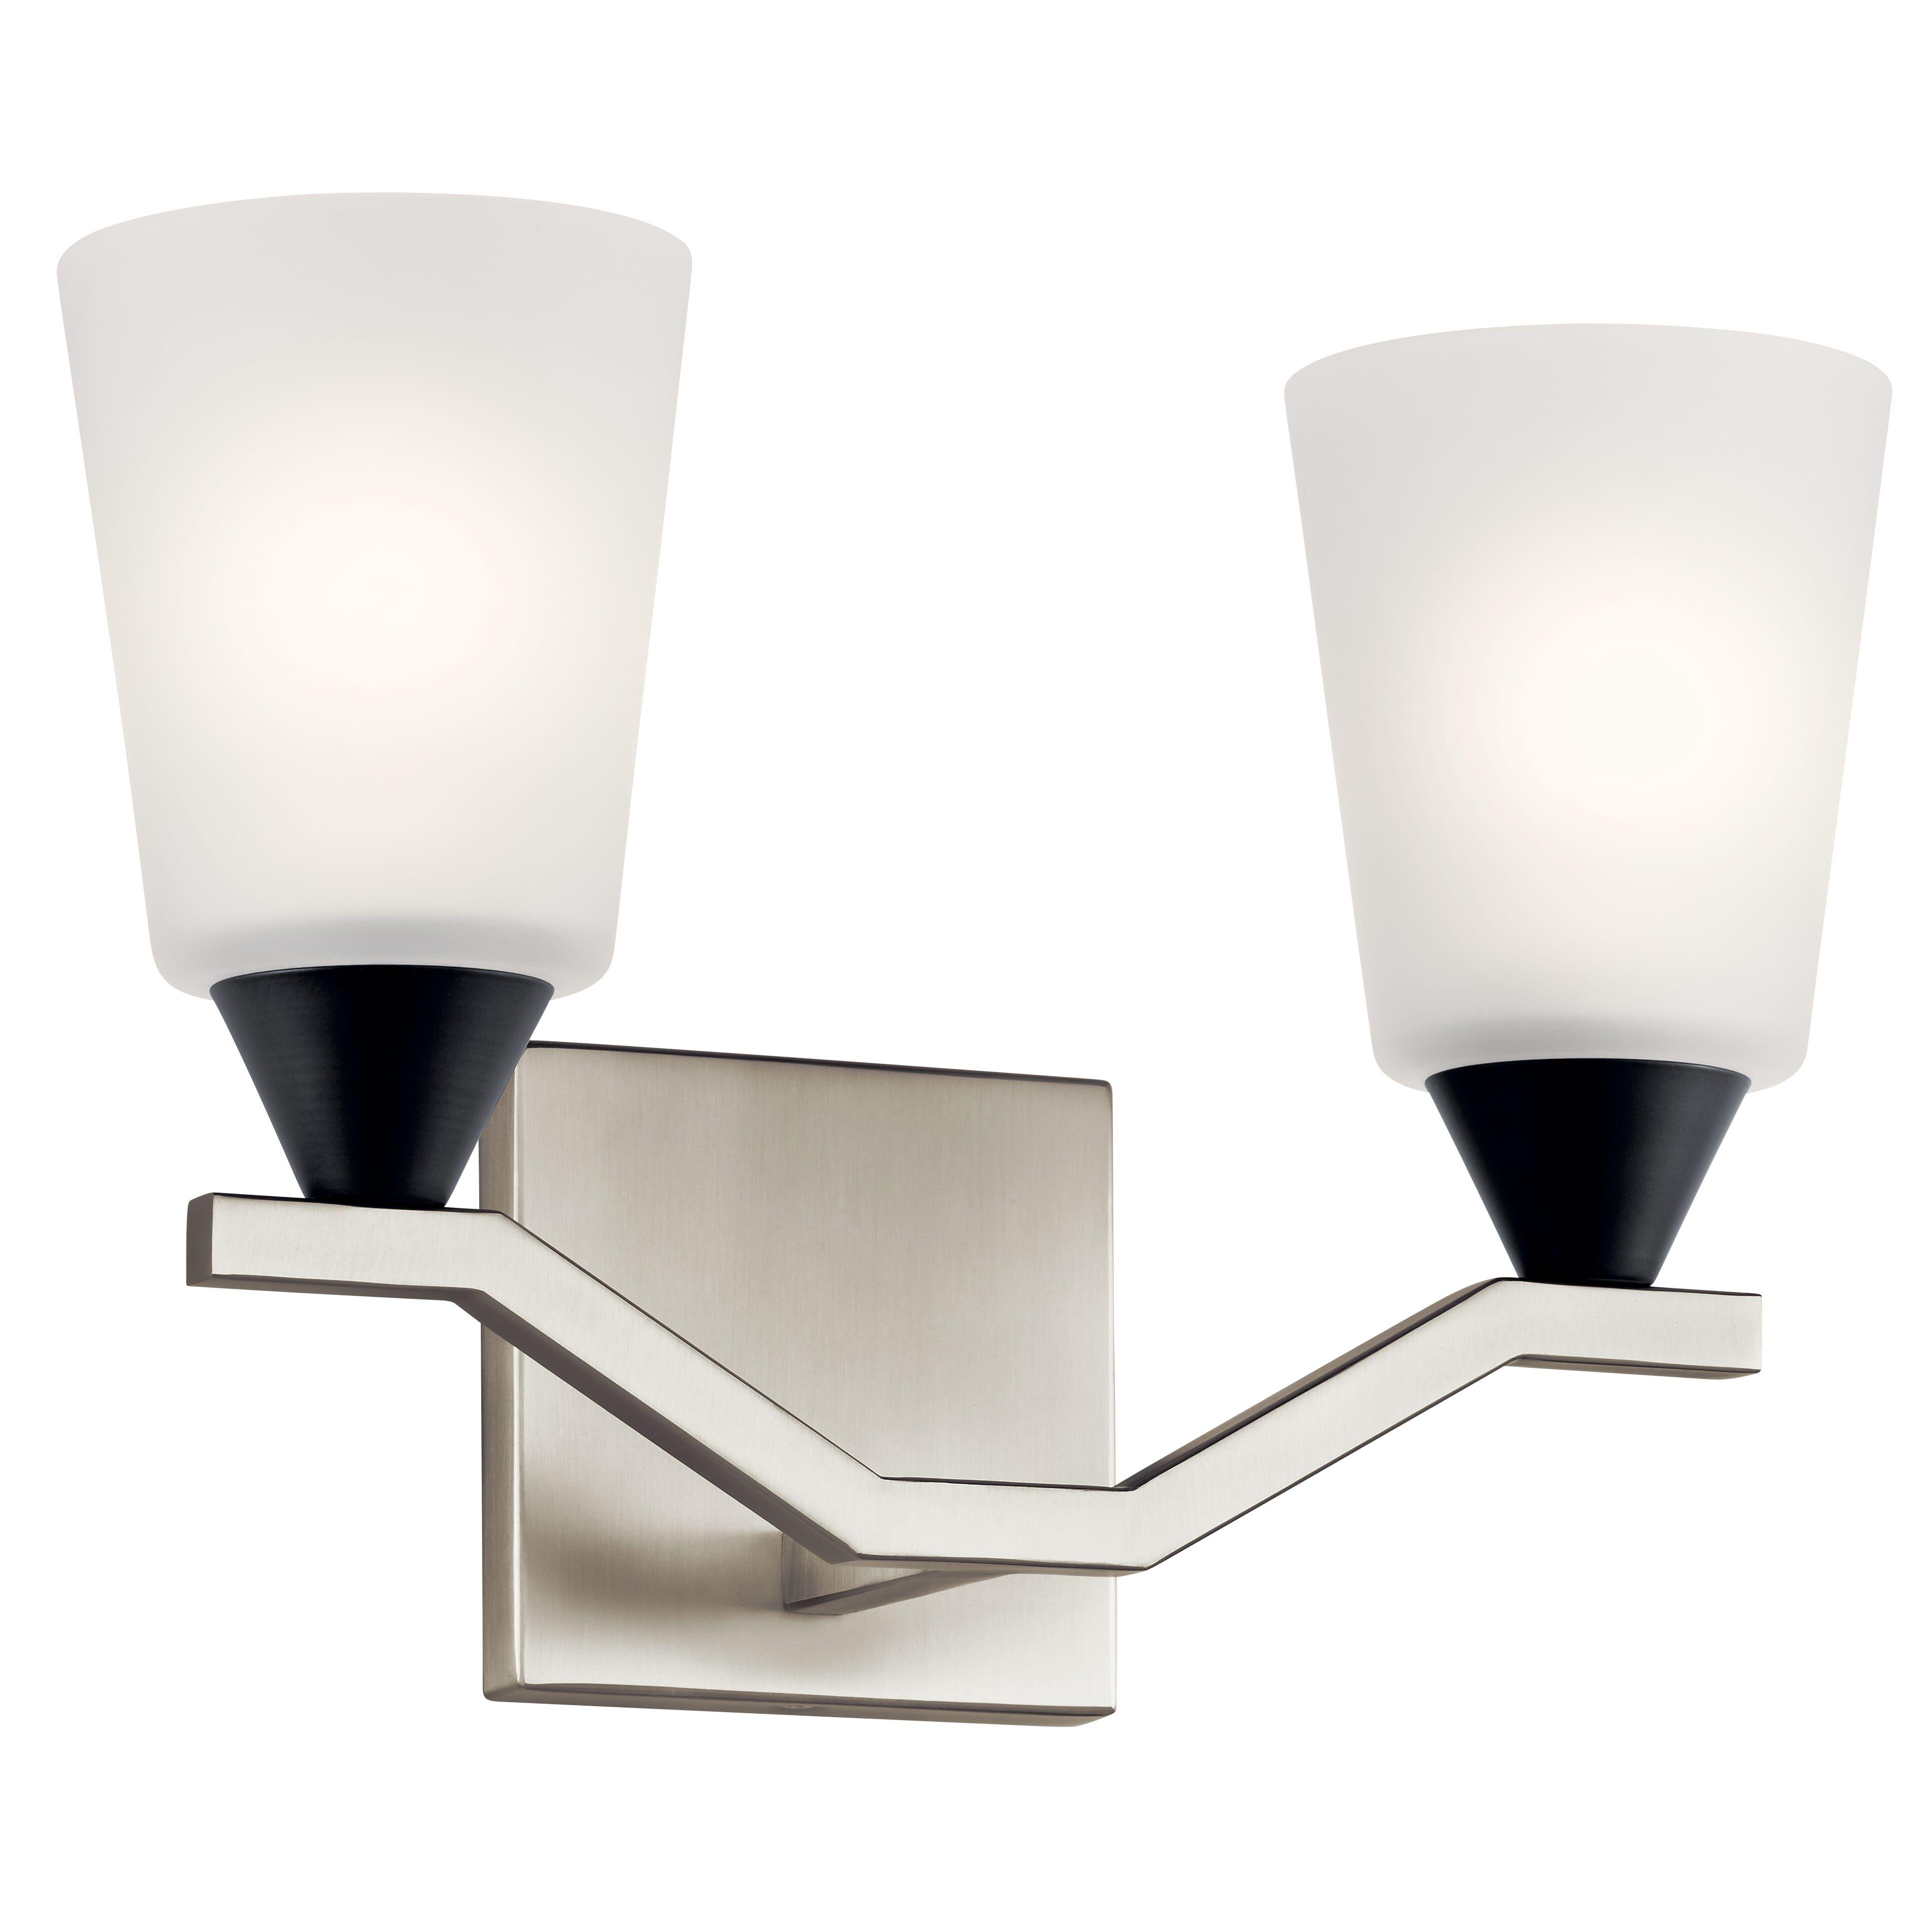 "Photo of Kichler Skagos 2-Light 14 ""wash basin lamp made of brushed nickel"